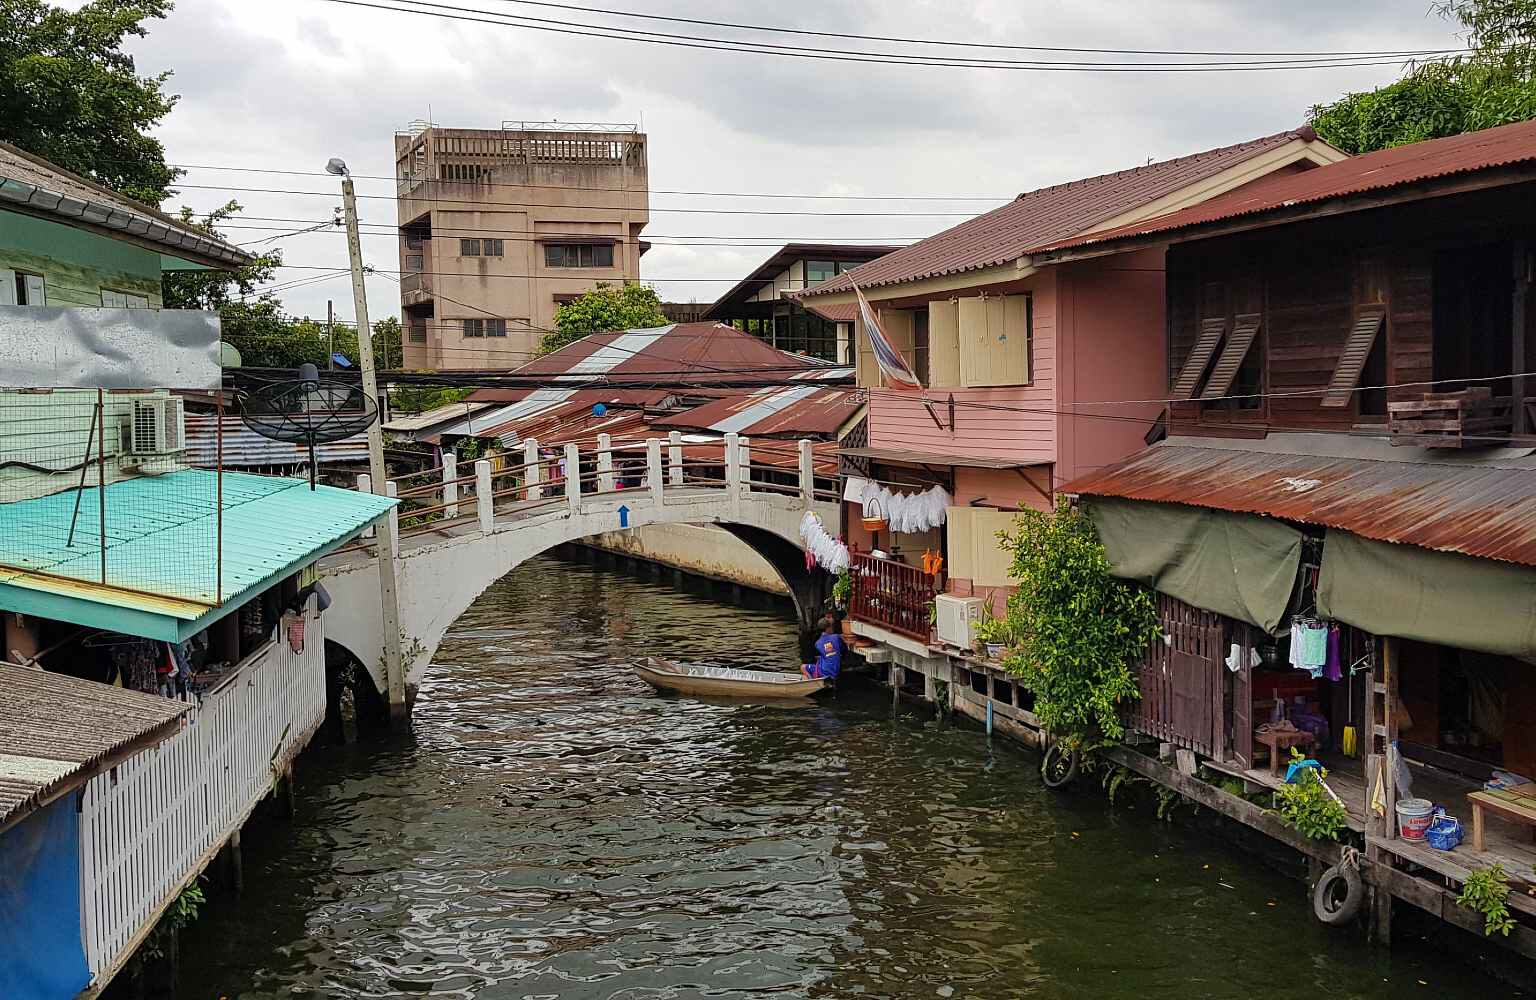 Steil bruggetje over het smalle kanaal